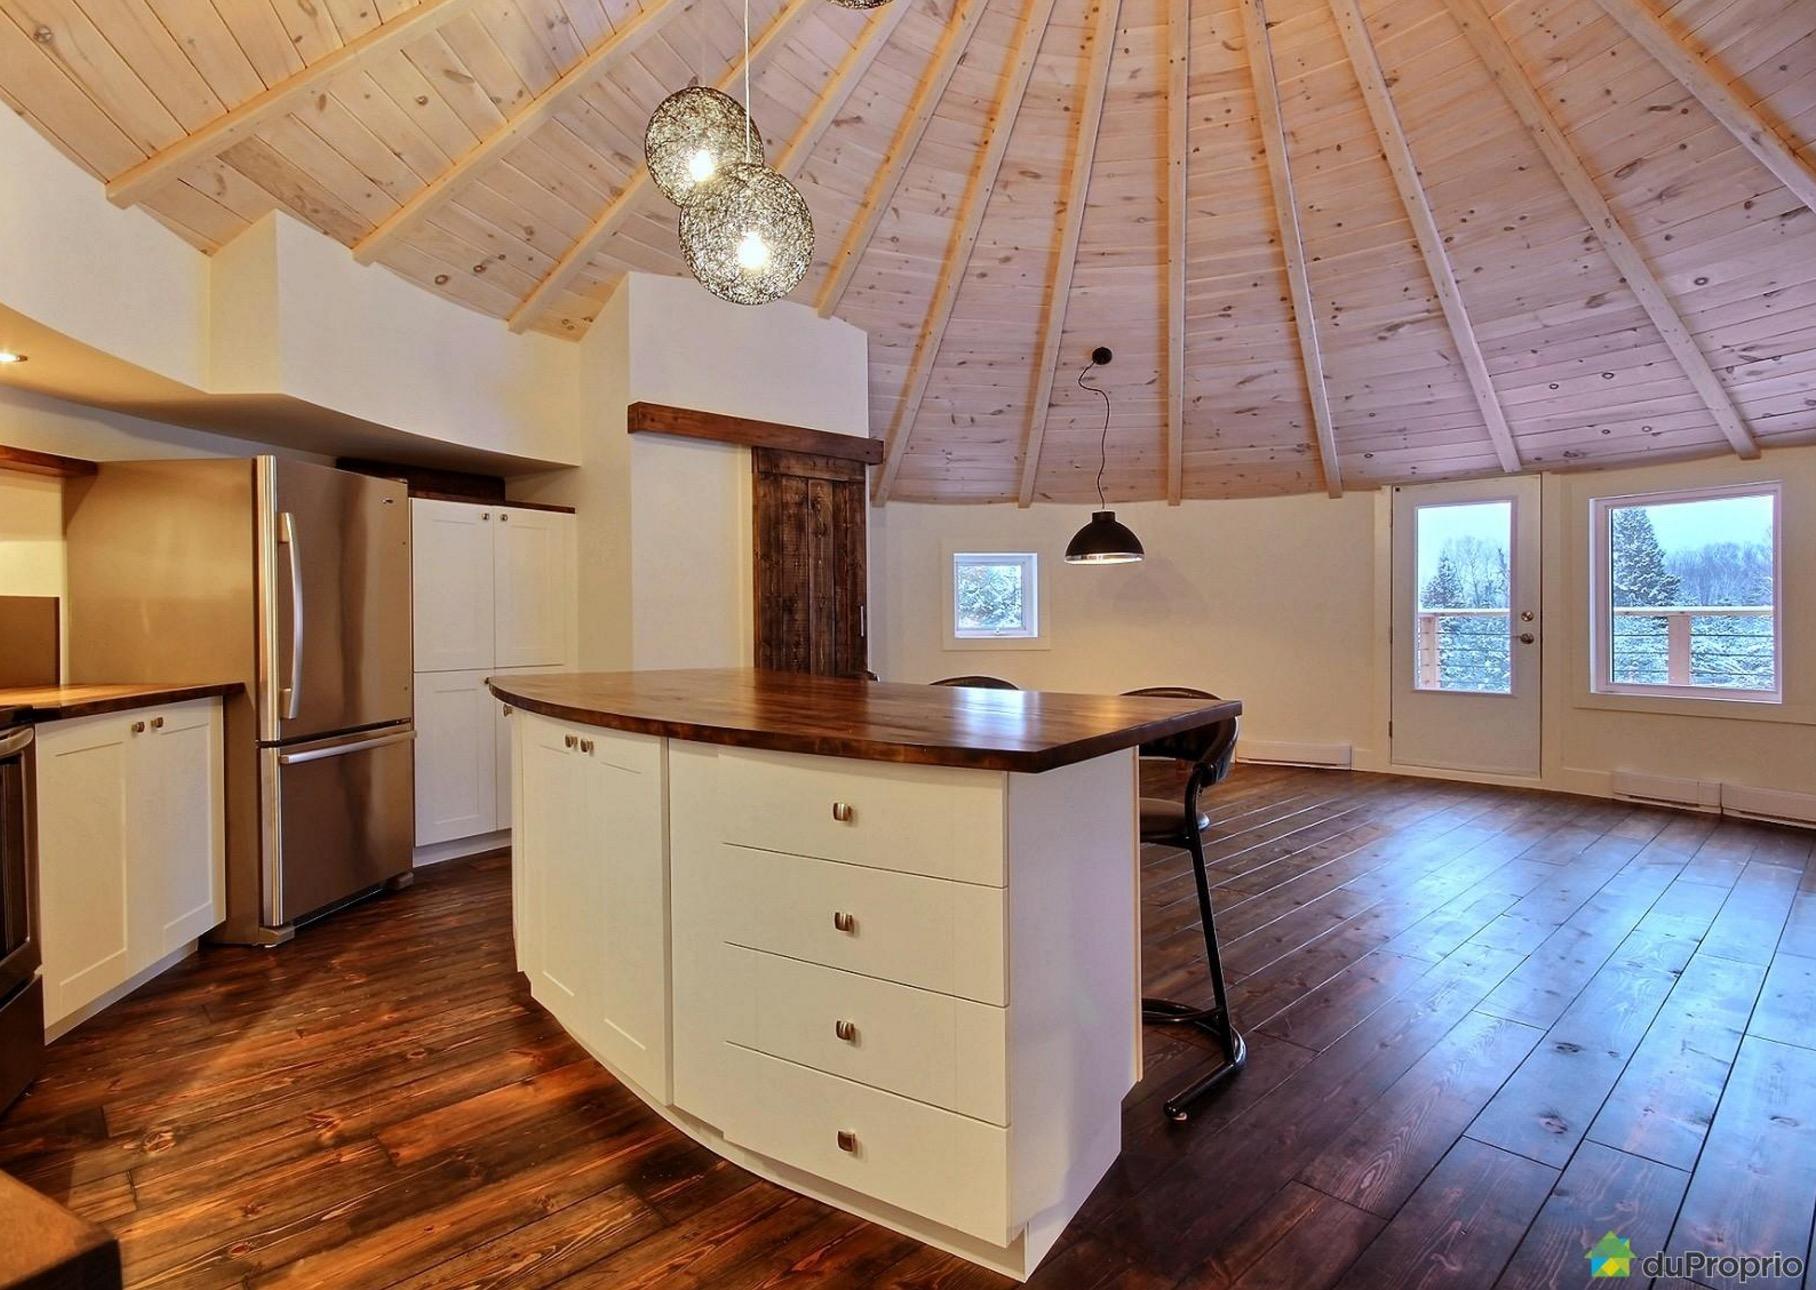 une maison comportant un silo  u00e0 grain dans son b u00e2timent est  u00e0 vendre  u00e0 st